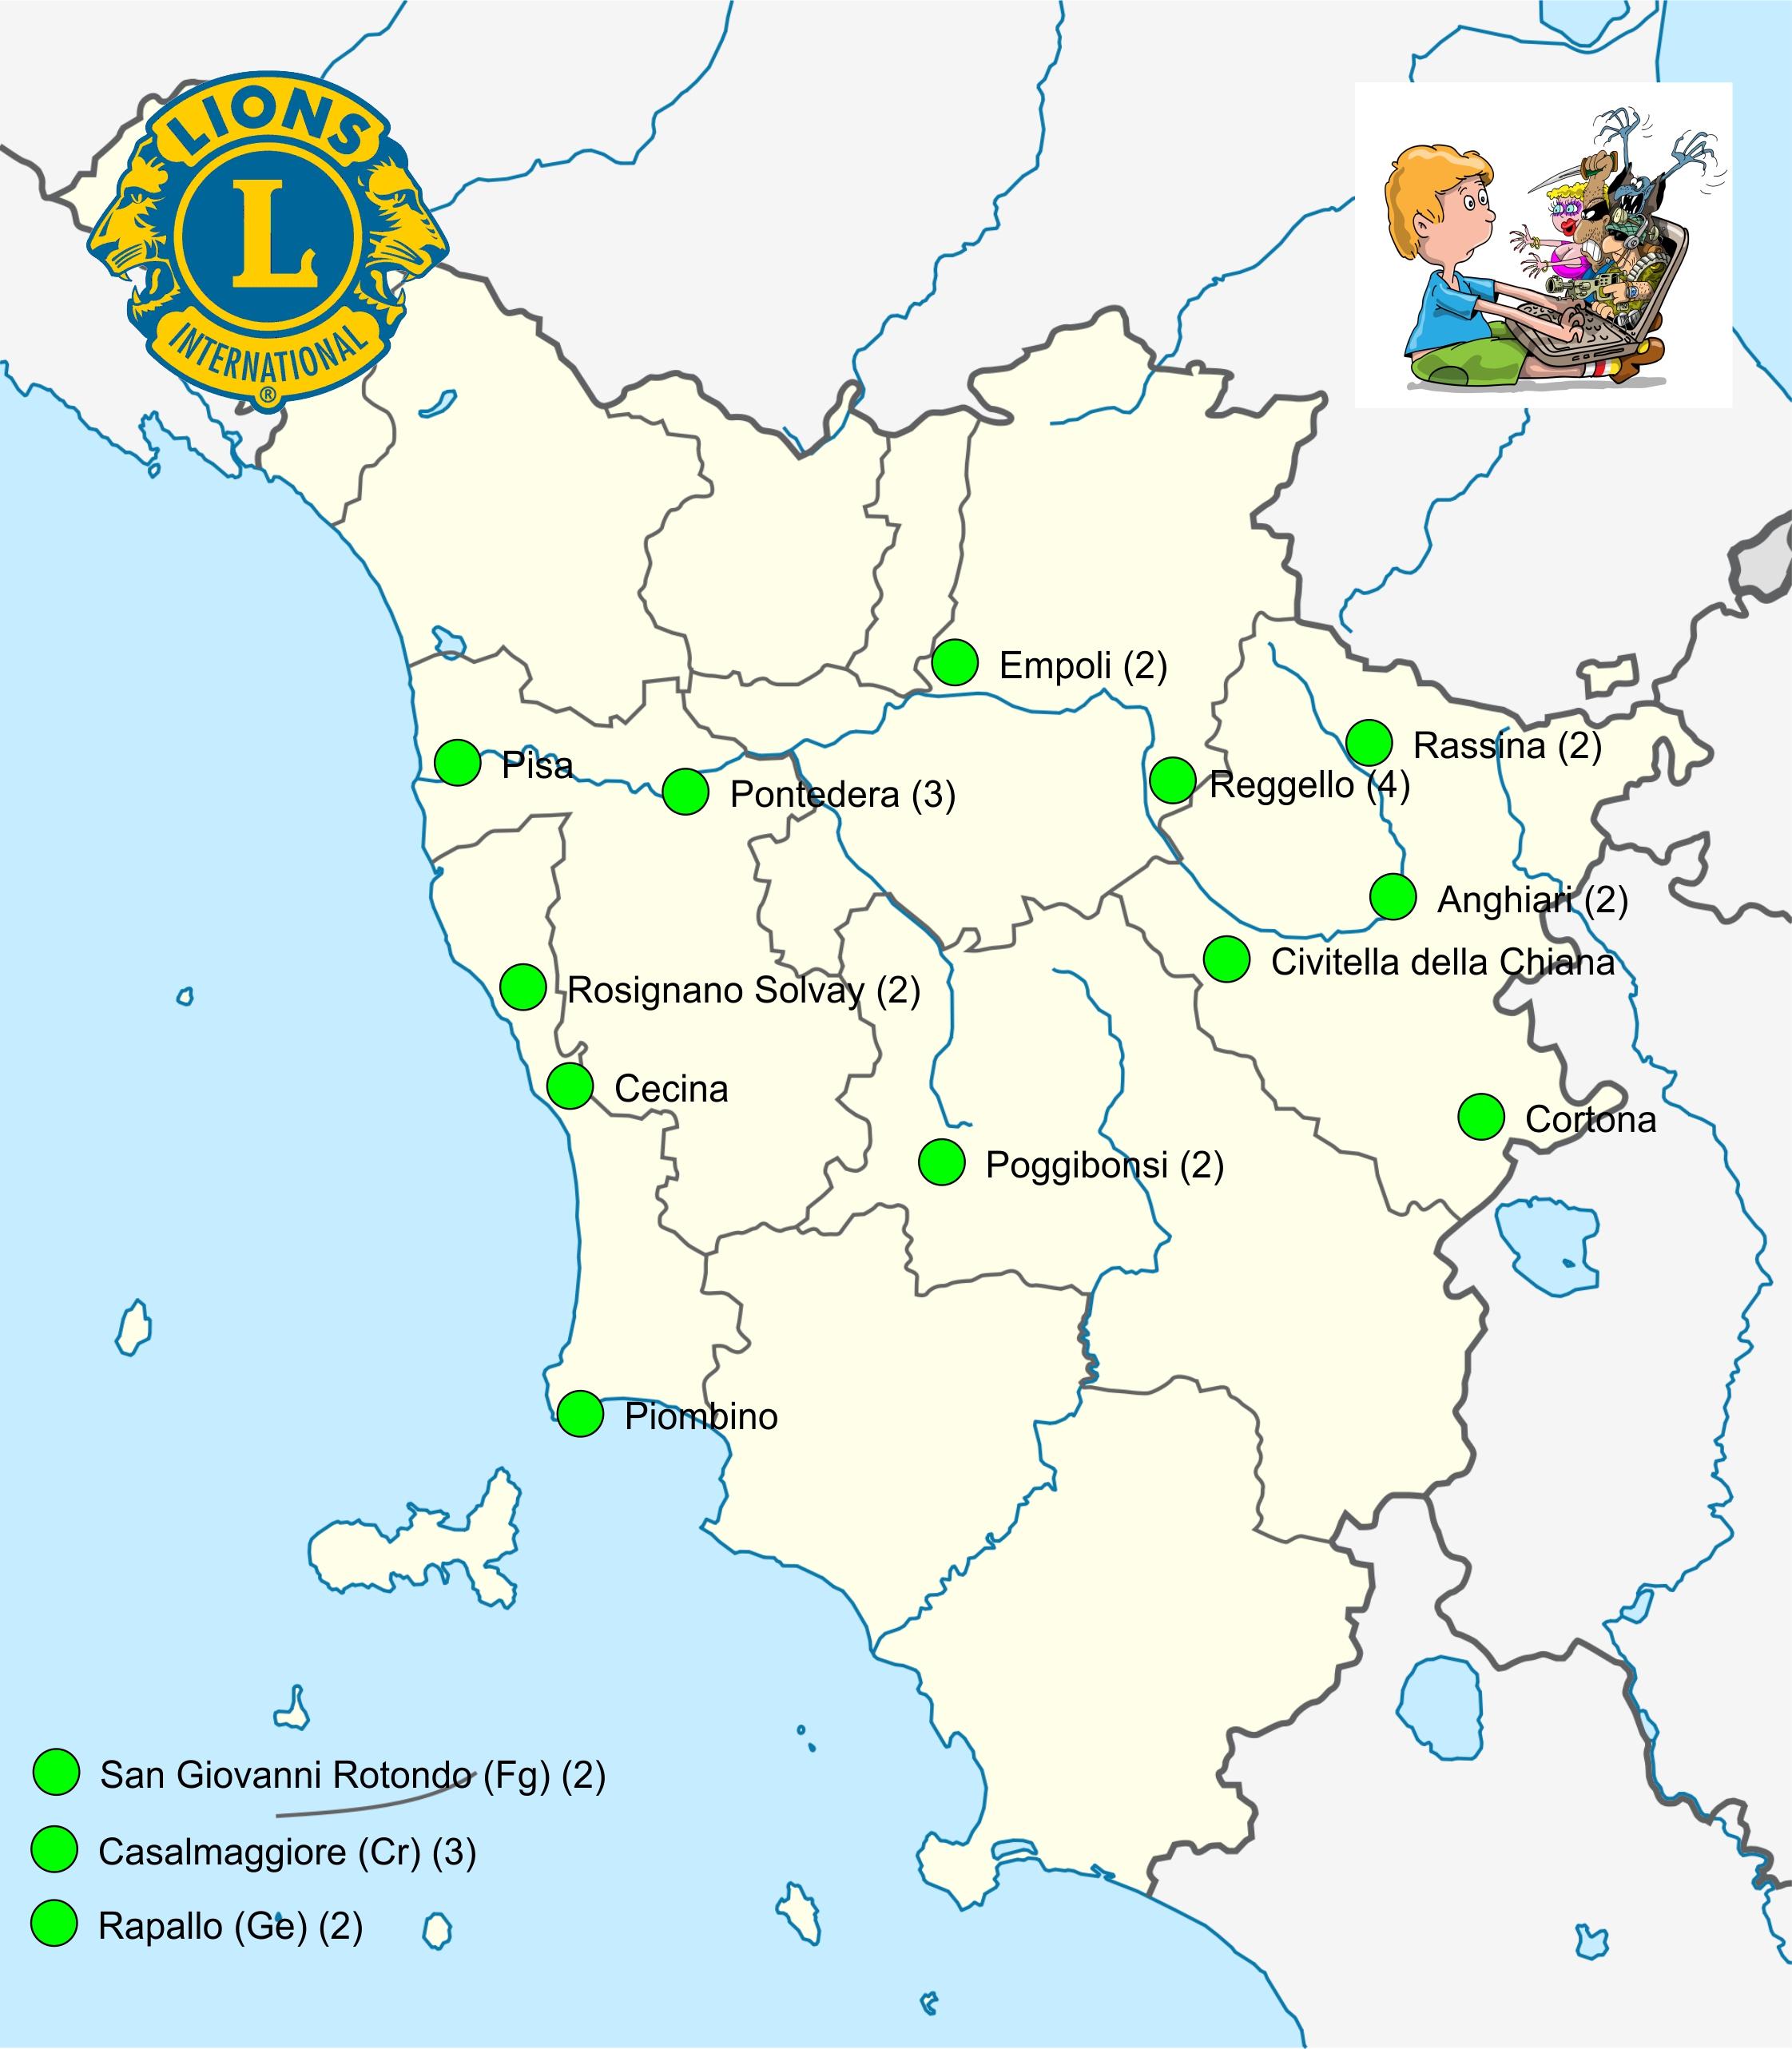 Www Cartina Toscana.Cartina Toscana Aggiornata Lions Club International Multidistretto 108 I T A L Y